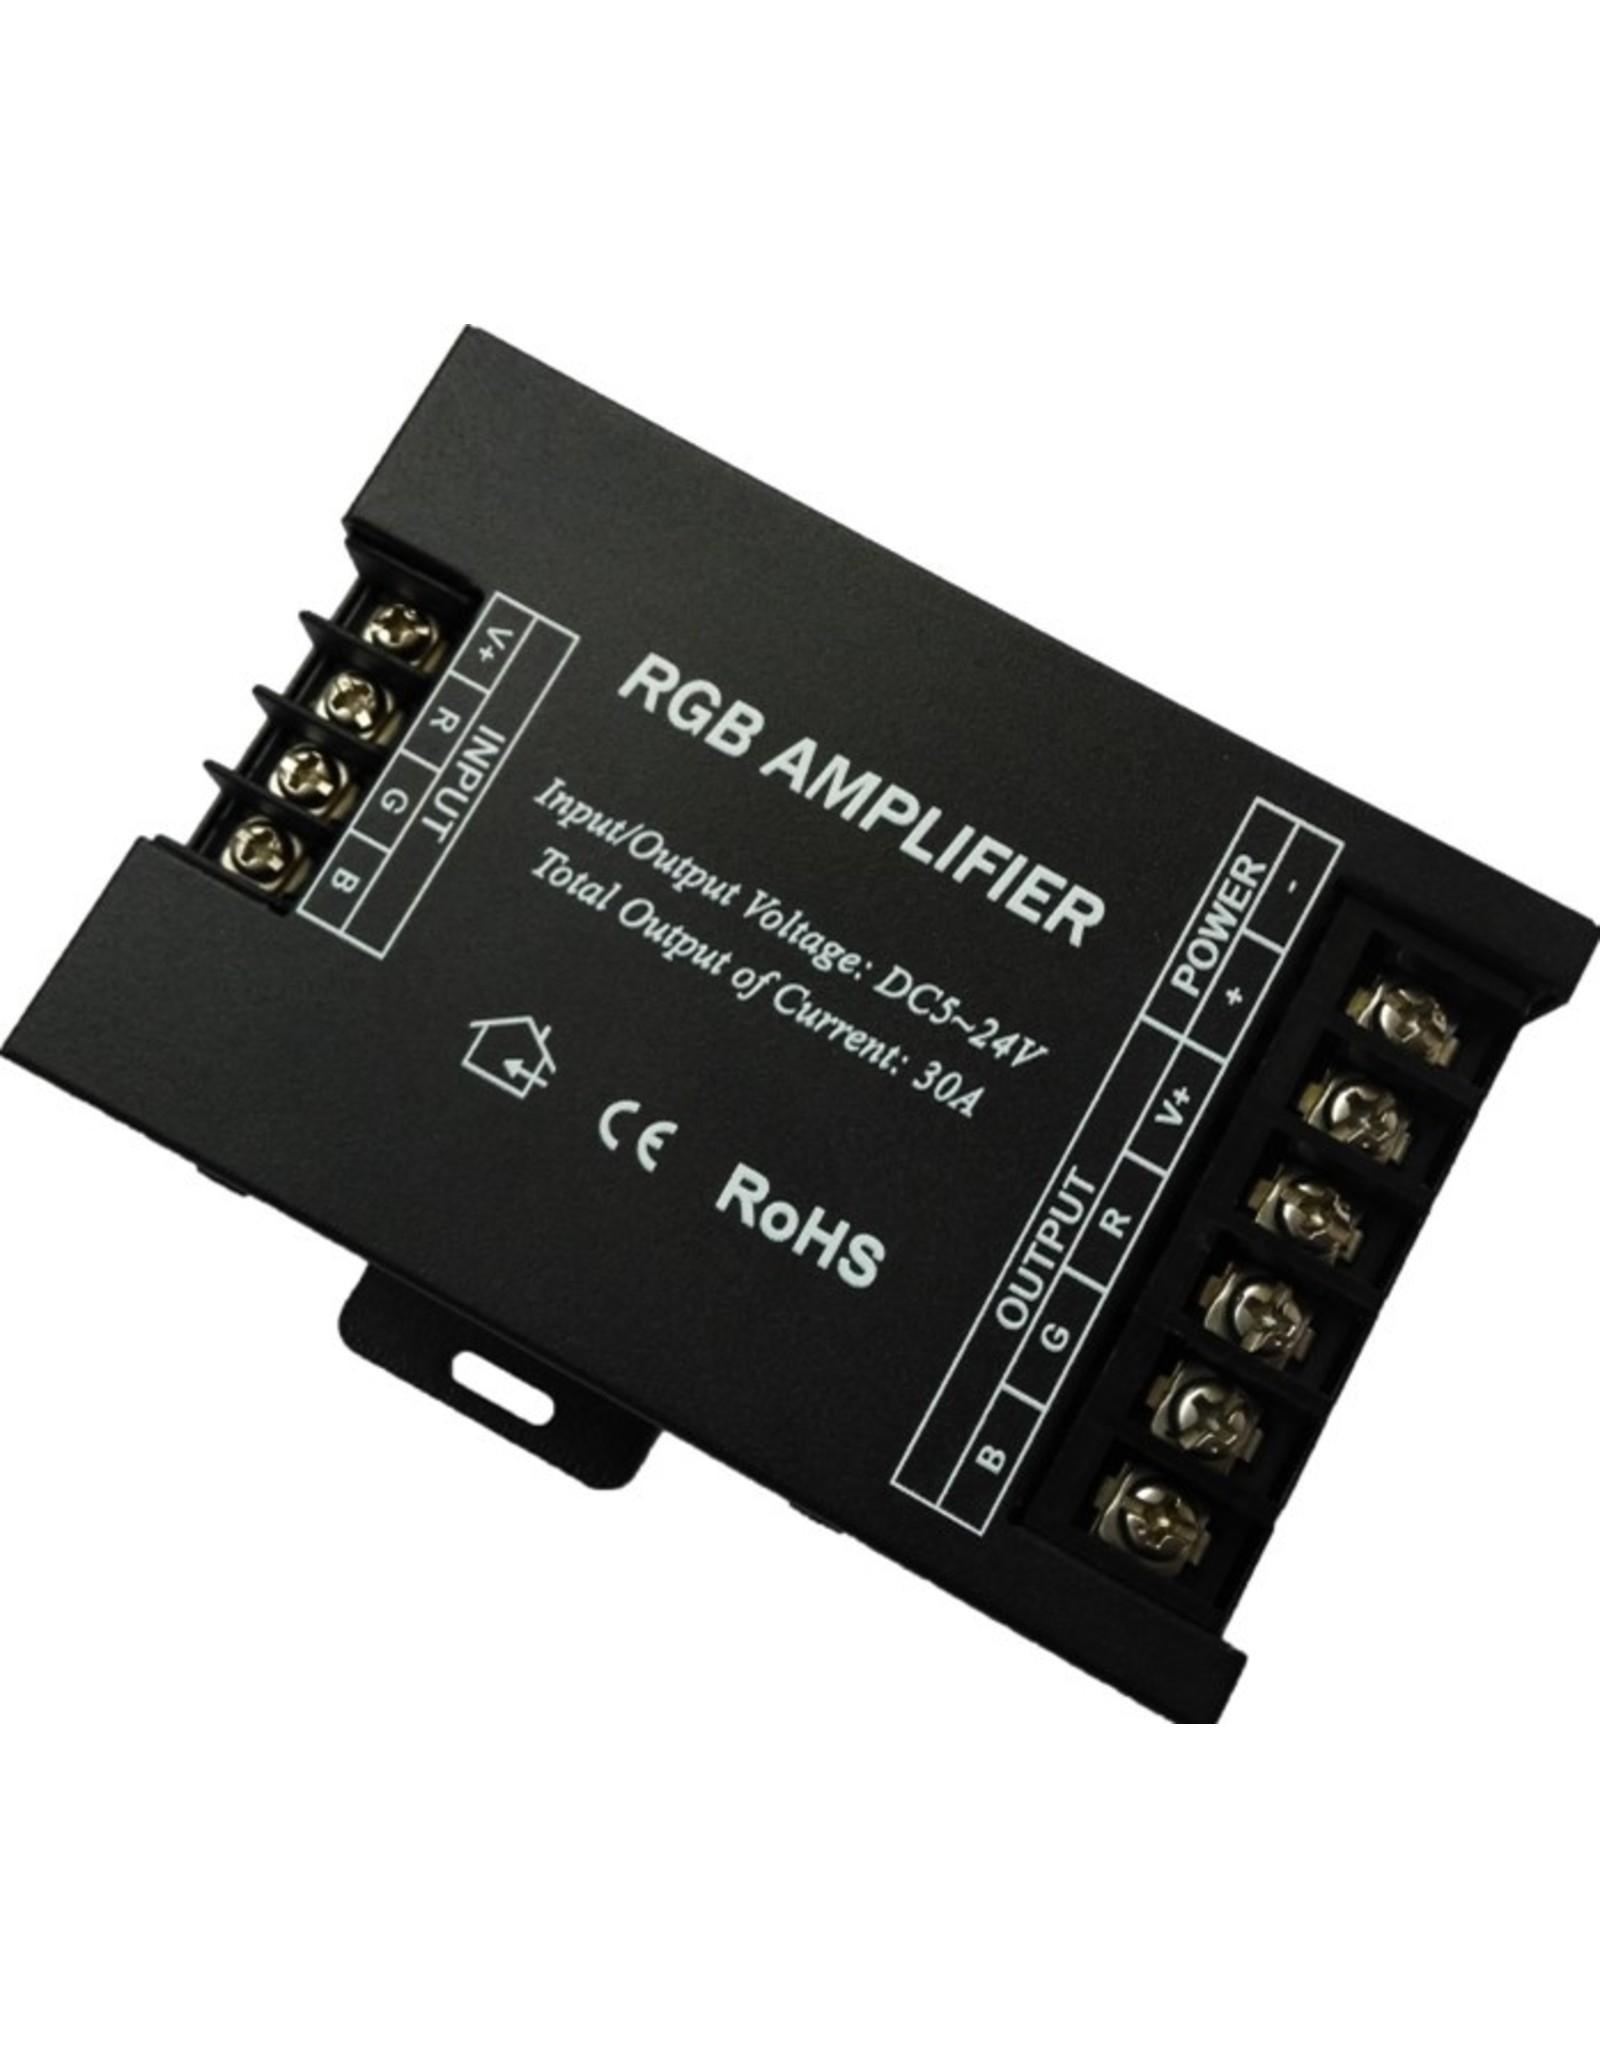 Lights RGB repeater, 2-24vdc, 3*10a